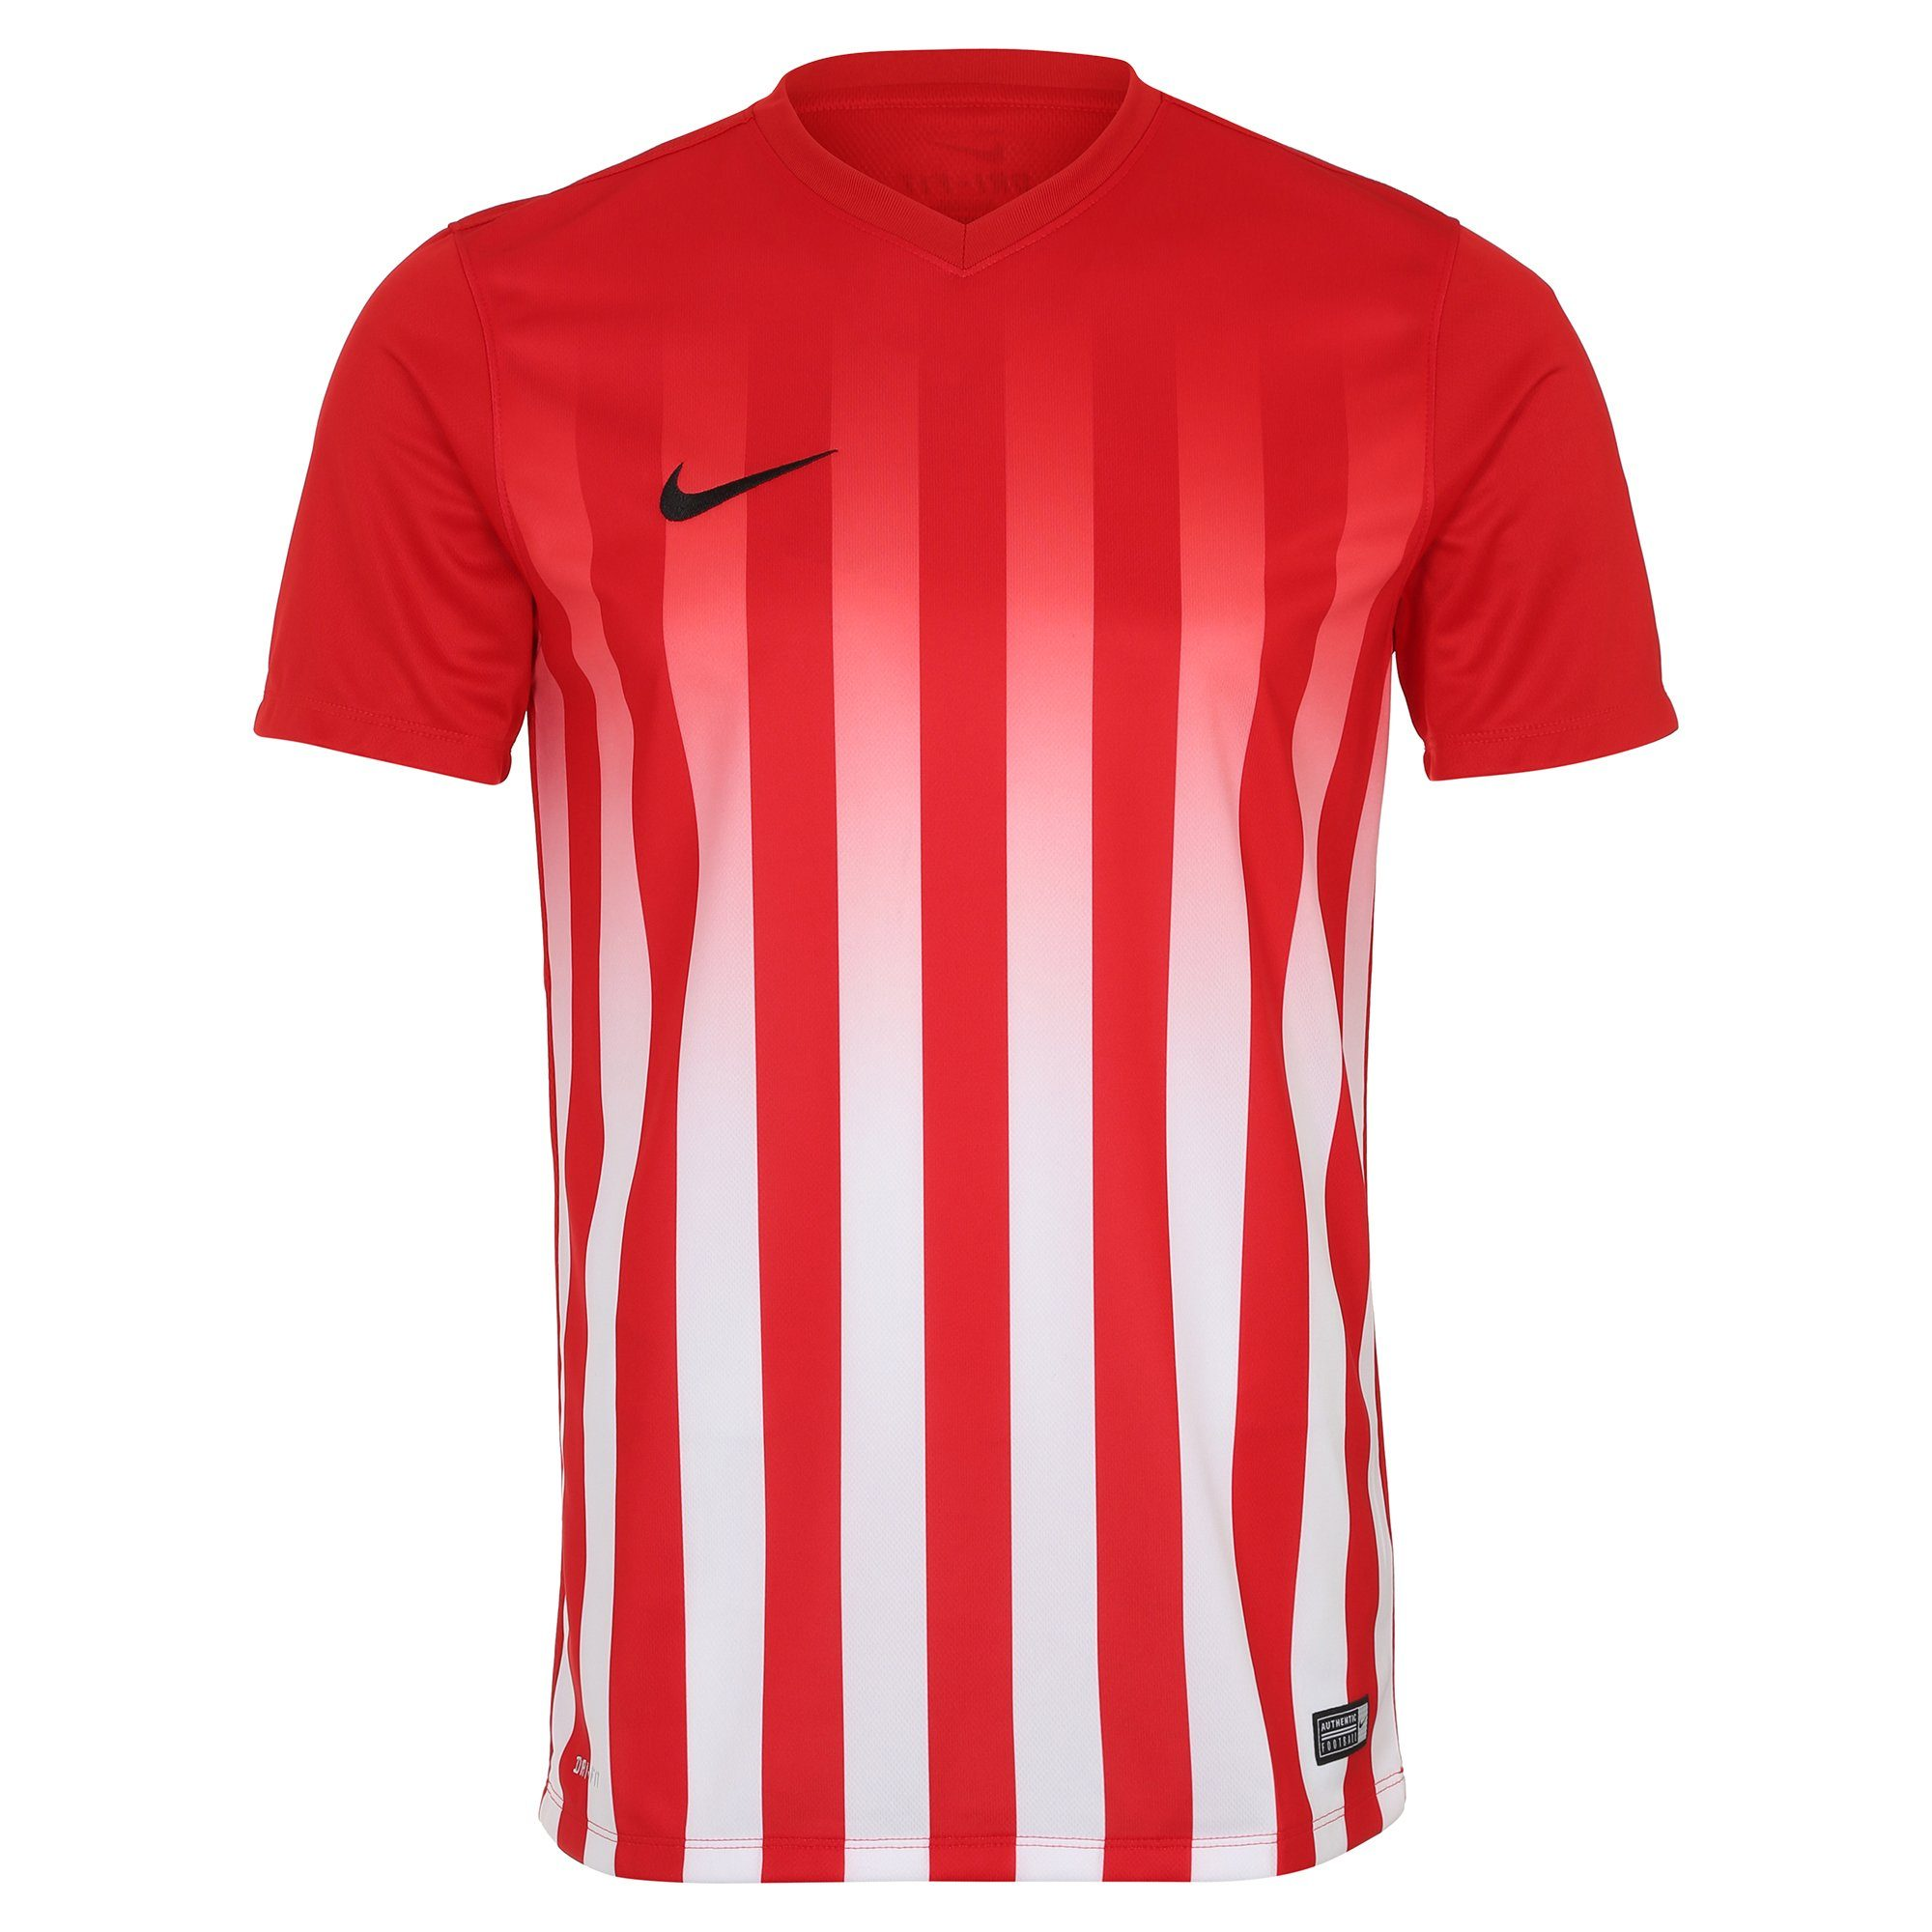 Nike Fußballtrikot Striped Division Ii | Sportbekleidung > Trikots | Rot | Ab - Trikot | Nike